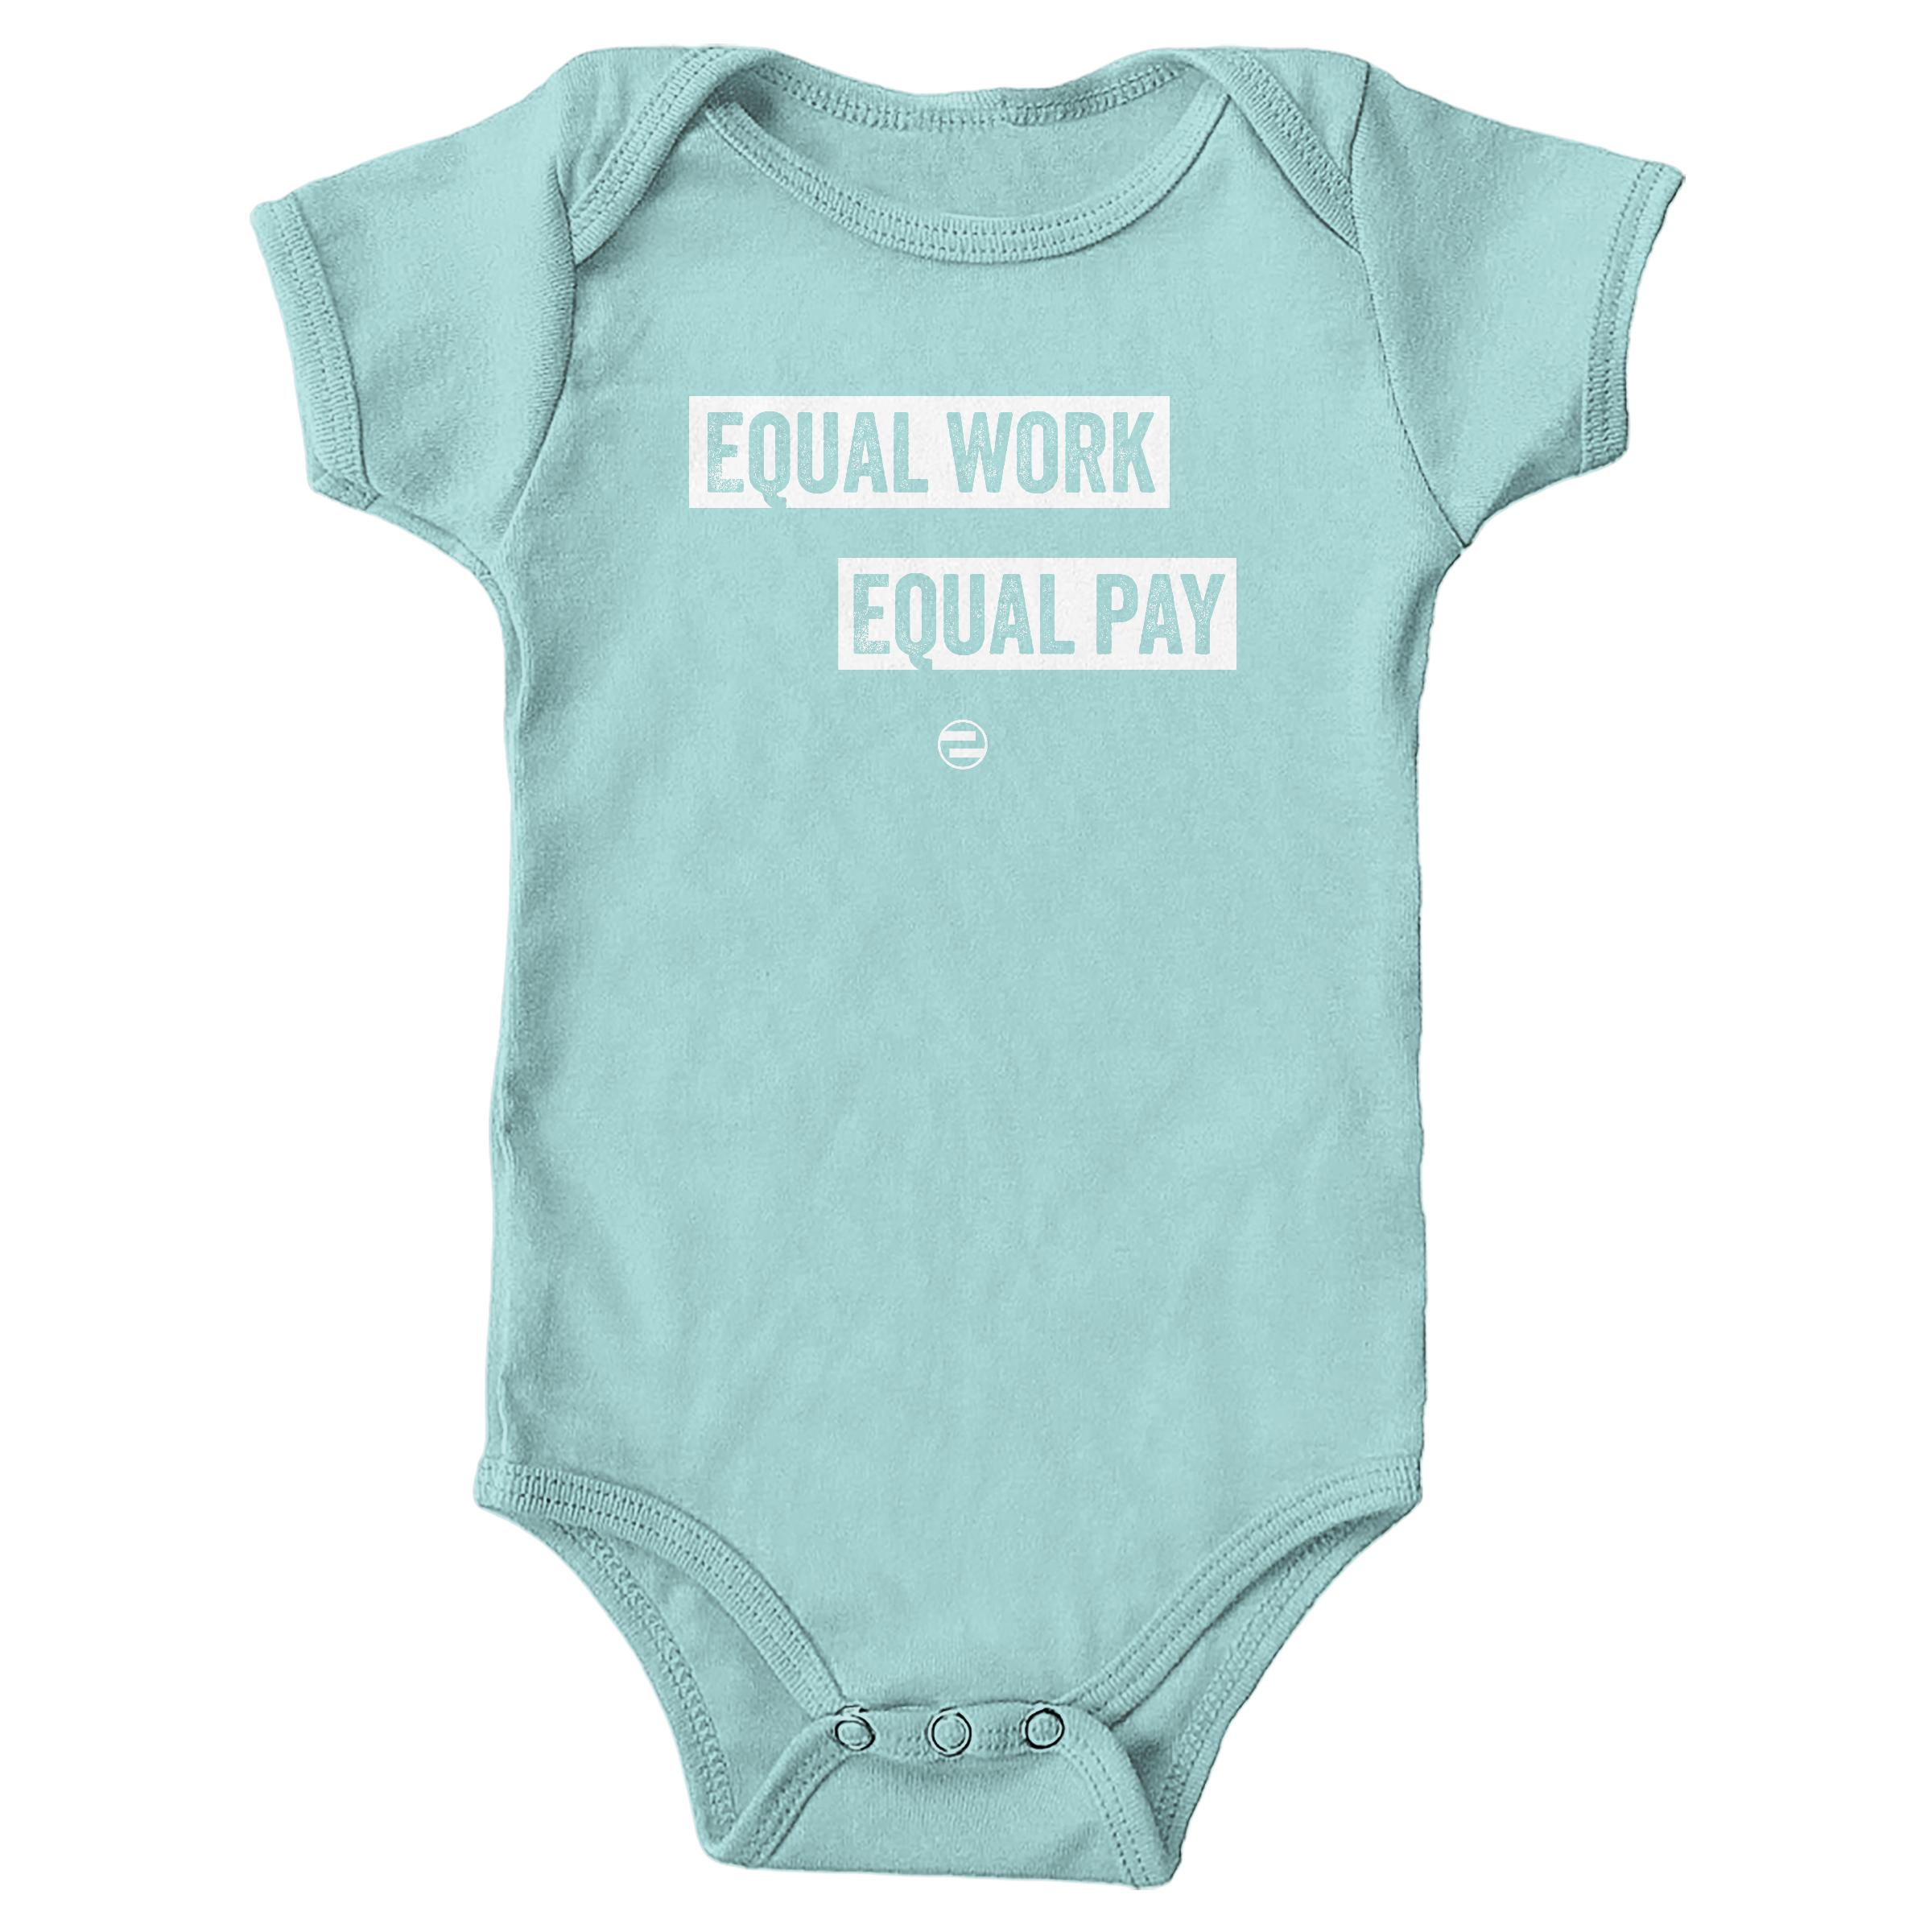 "GenEquality ""Equal Work Equal Pay"" Kids Tee & Onesie Chill (Onesie)"